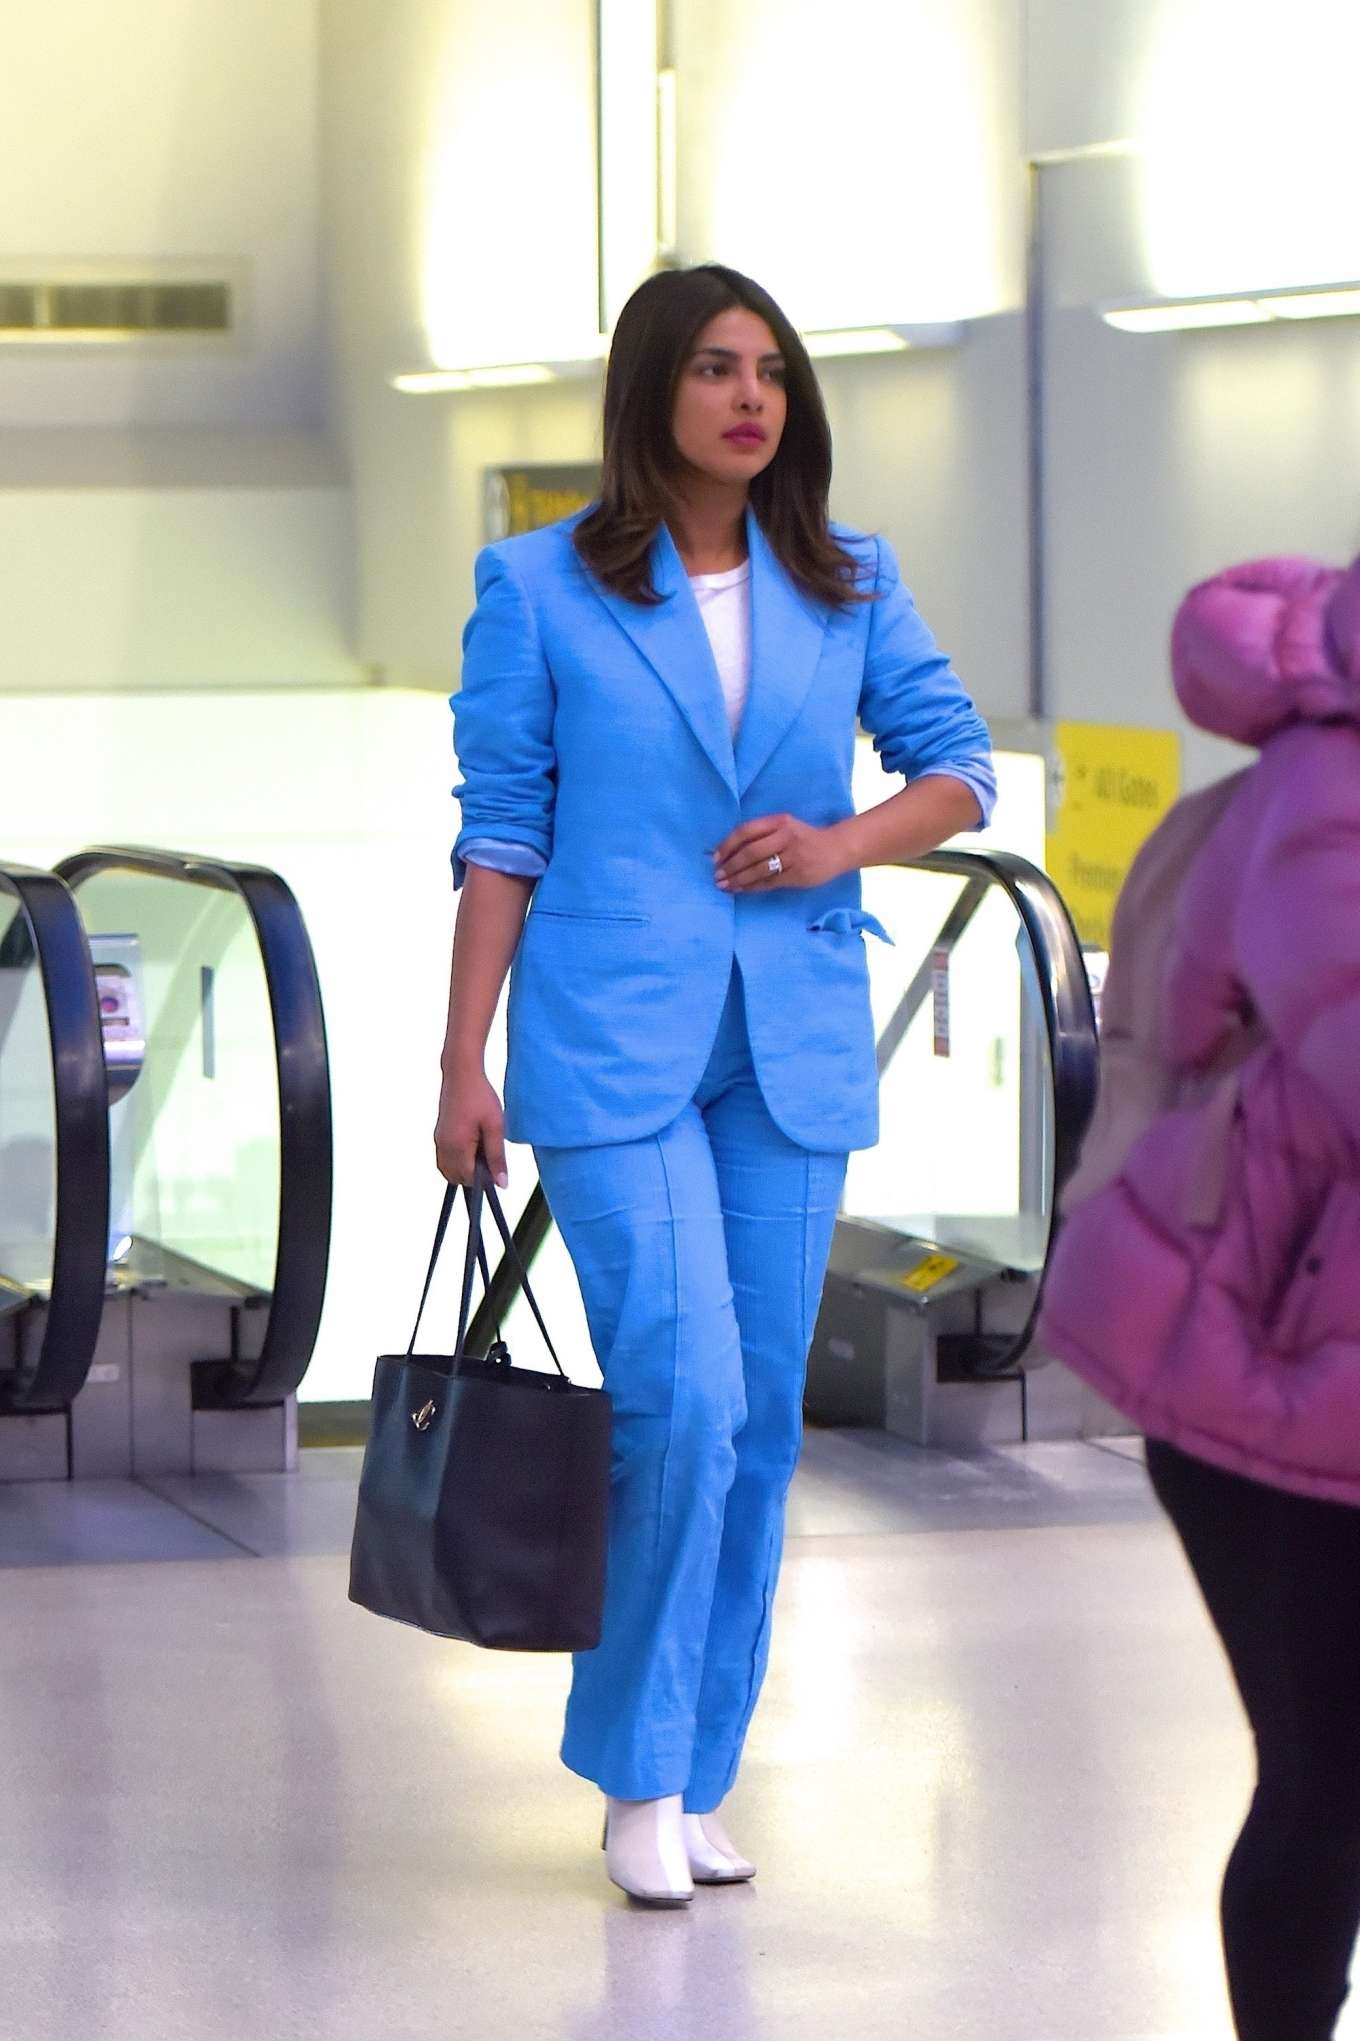 Priyanka Chopra rocking narrow white leather boots with high heel